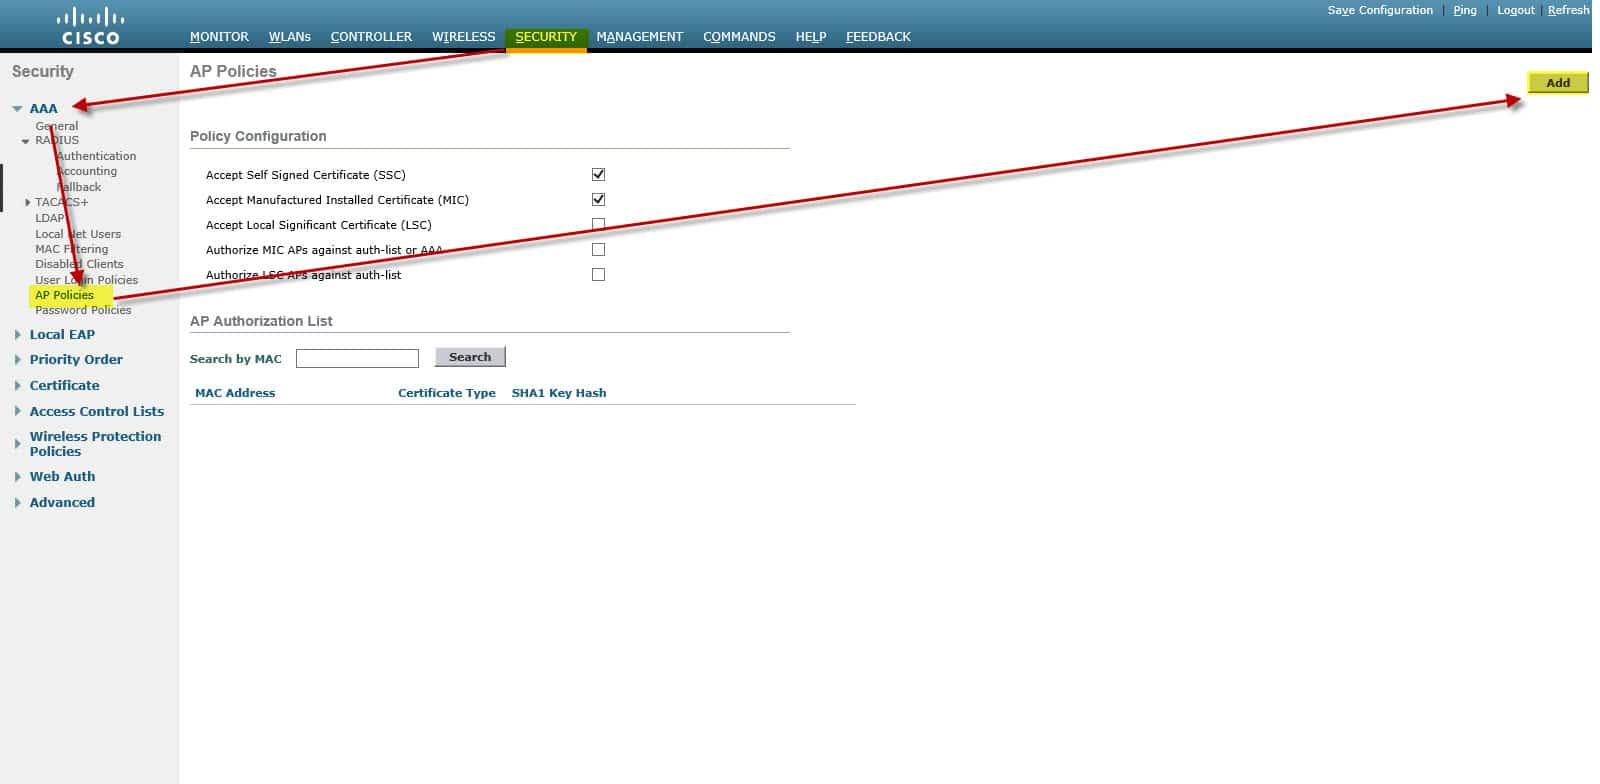 Cisco Wireless LAN Controller Security tab